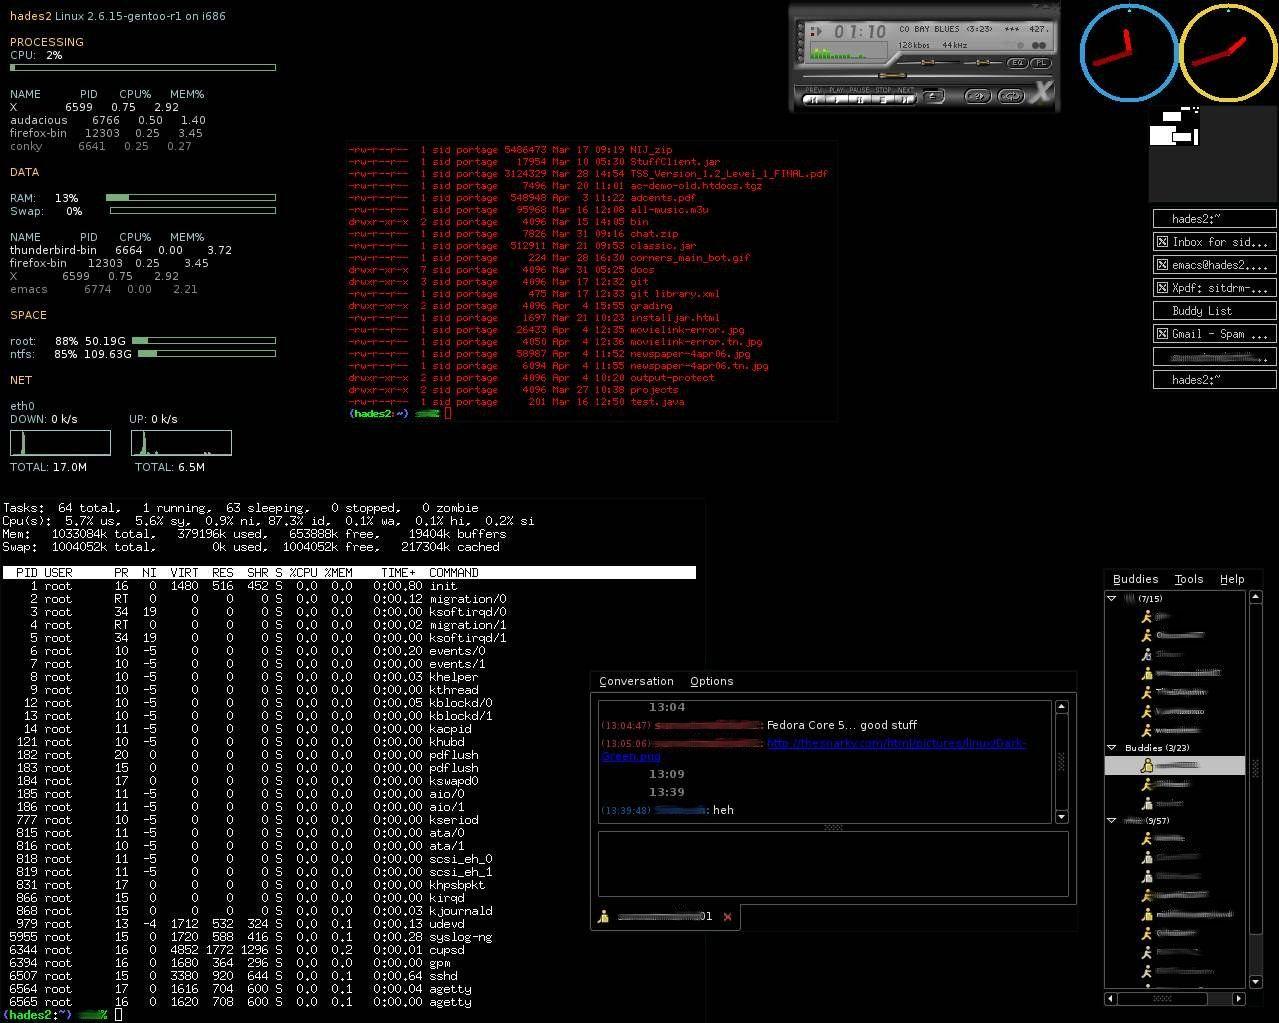 Gentoo #Linux #Desktop | Program in 2019 | Linux, Desktop, Programming